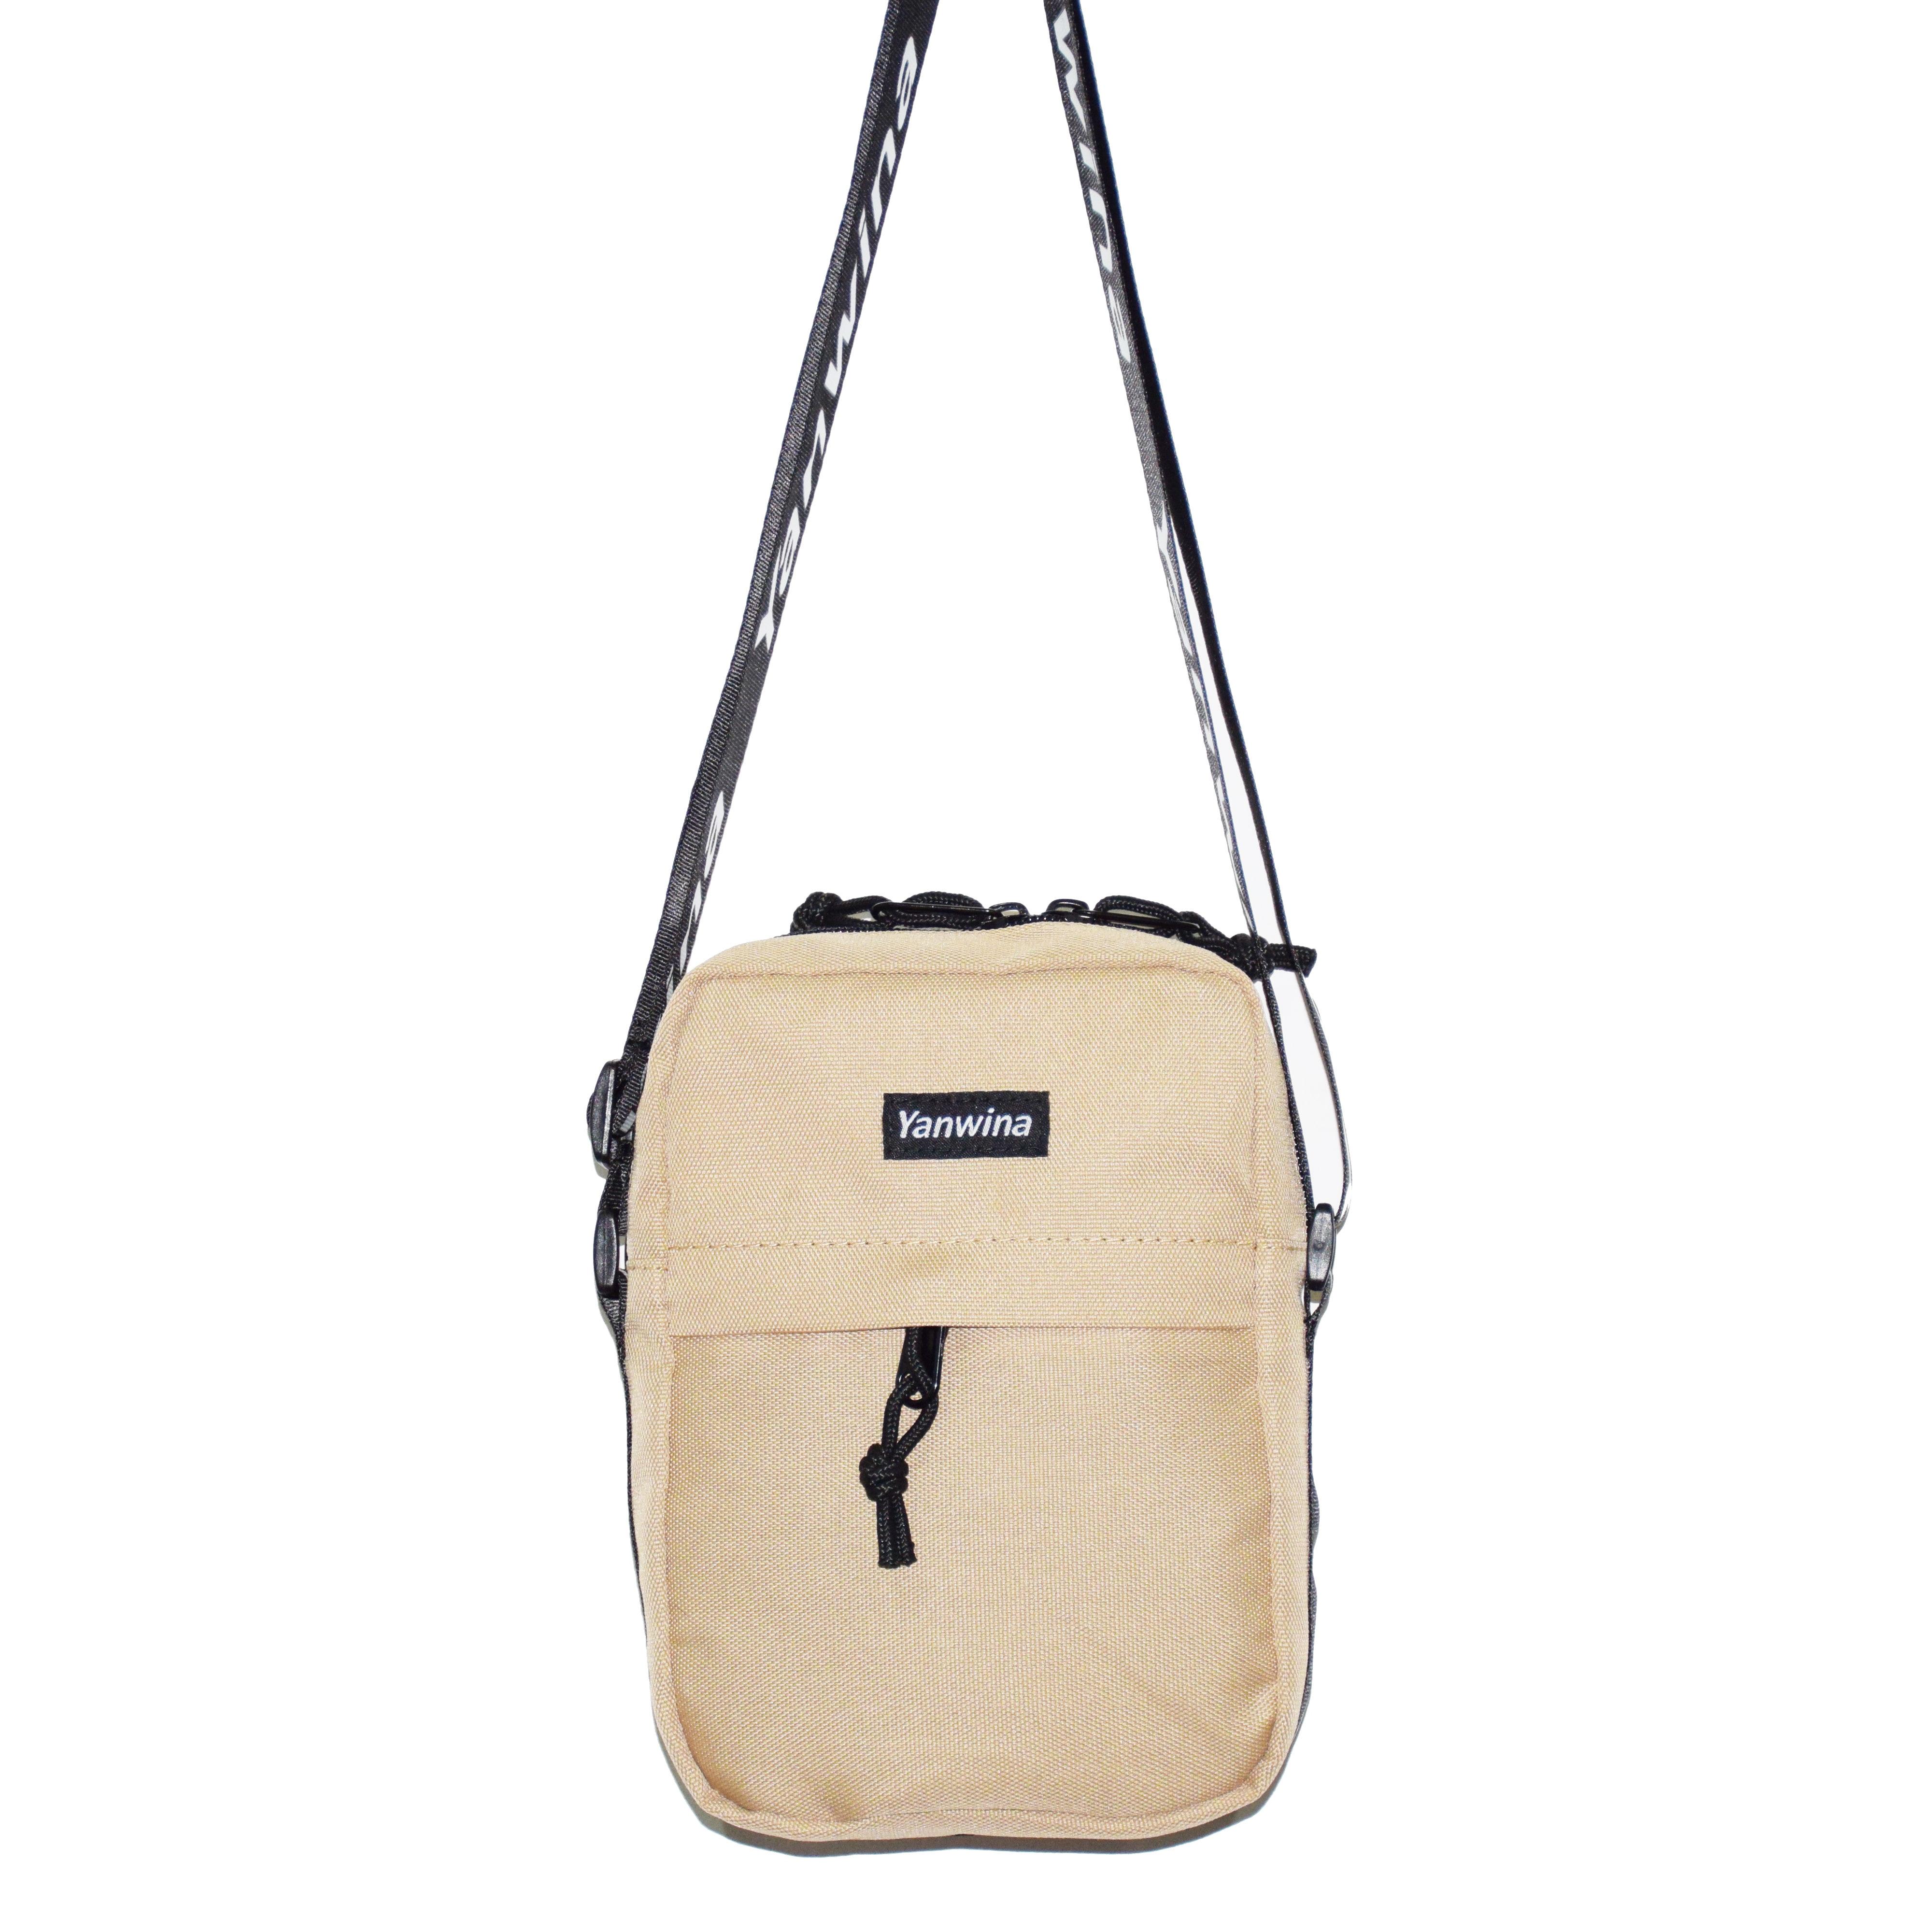 RICHARD BALDWIN Womens Large Capacity Ladies Messenger Bag Style Wind Female Bag Shoulder Bag Handbag